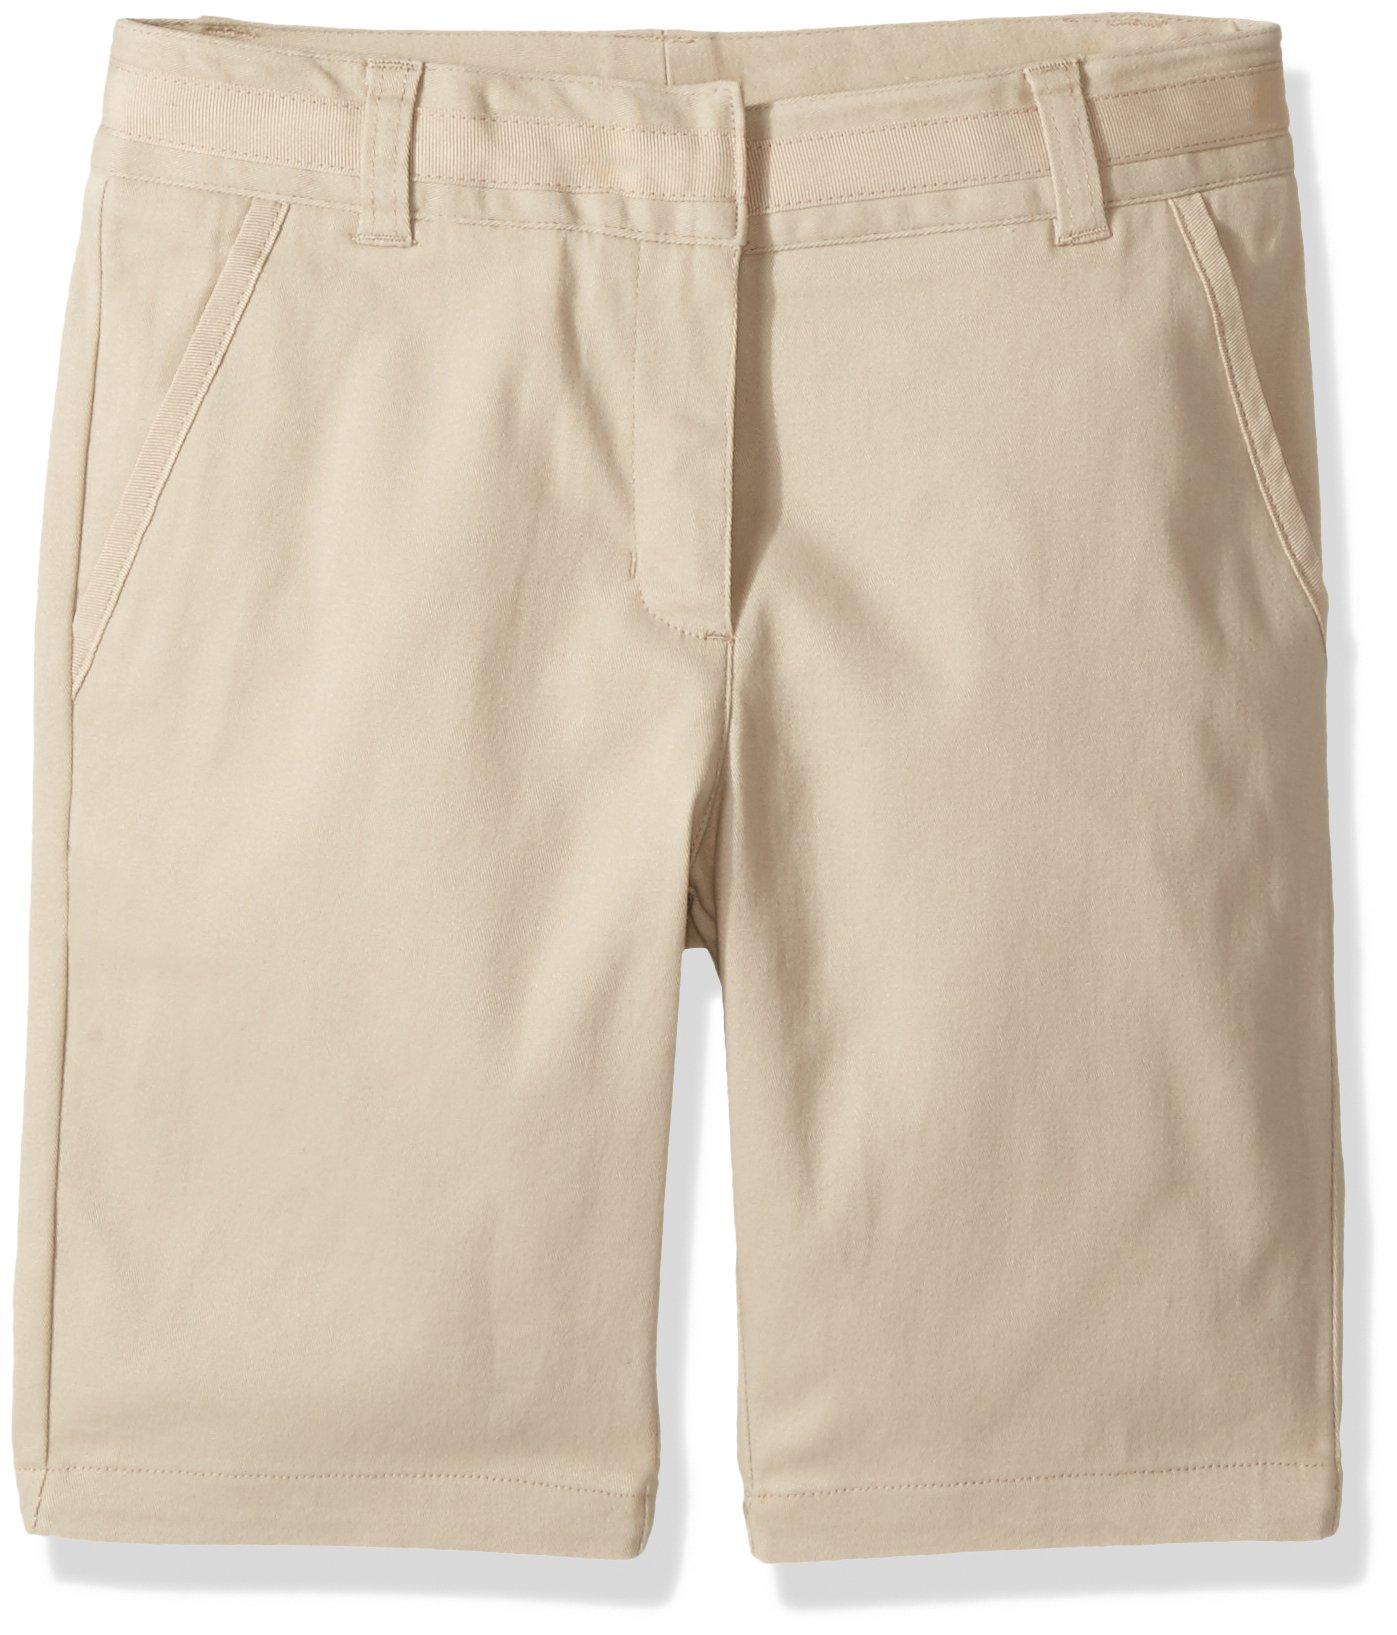 8.5 Plus Navy Nautica Girls Size School Uniform Skinny Twill Bermuda Short